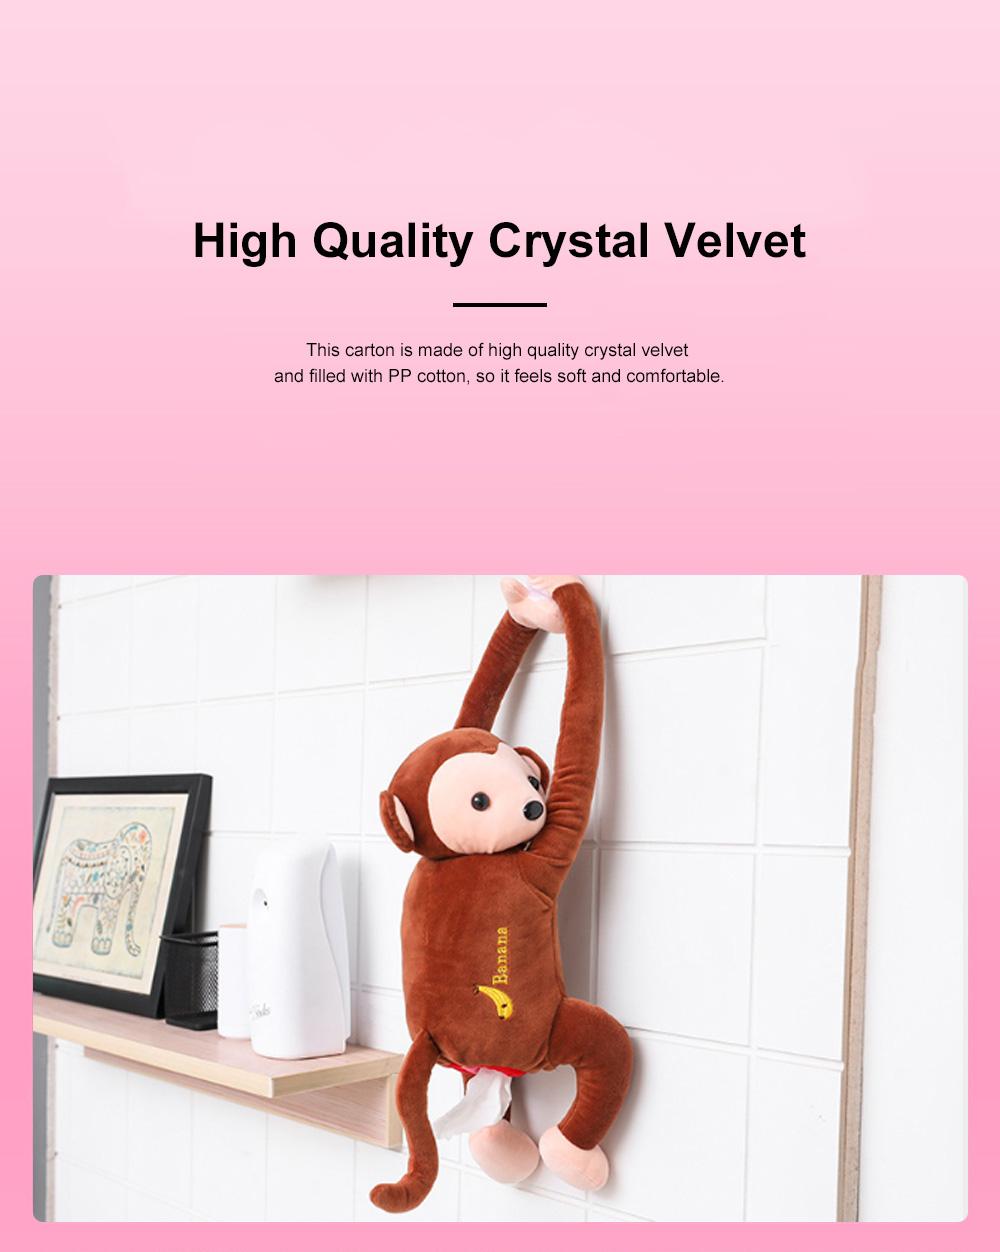 Monkey-shaped Hanging Paper Towel Boxes Popular Car Tissue Bag Pumping Carton Paper Towels Case TikTok Hot 6